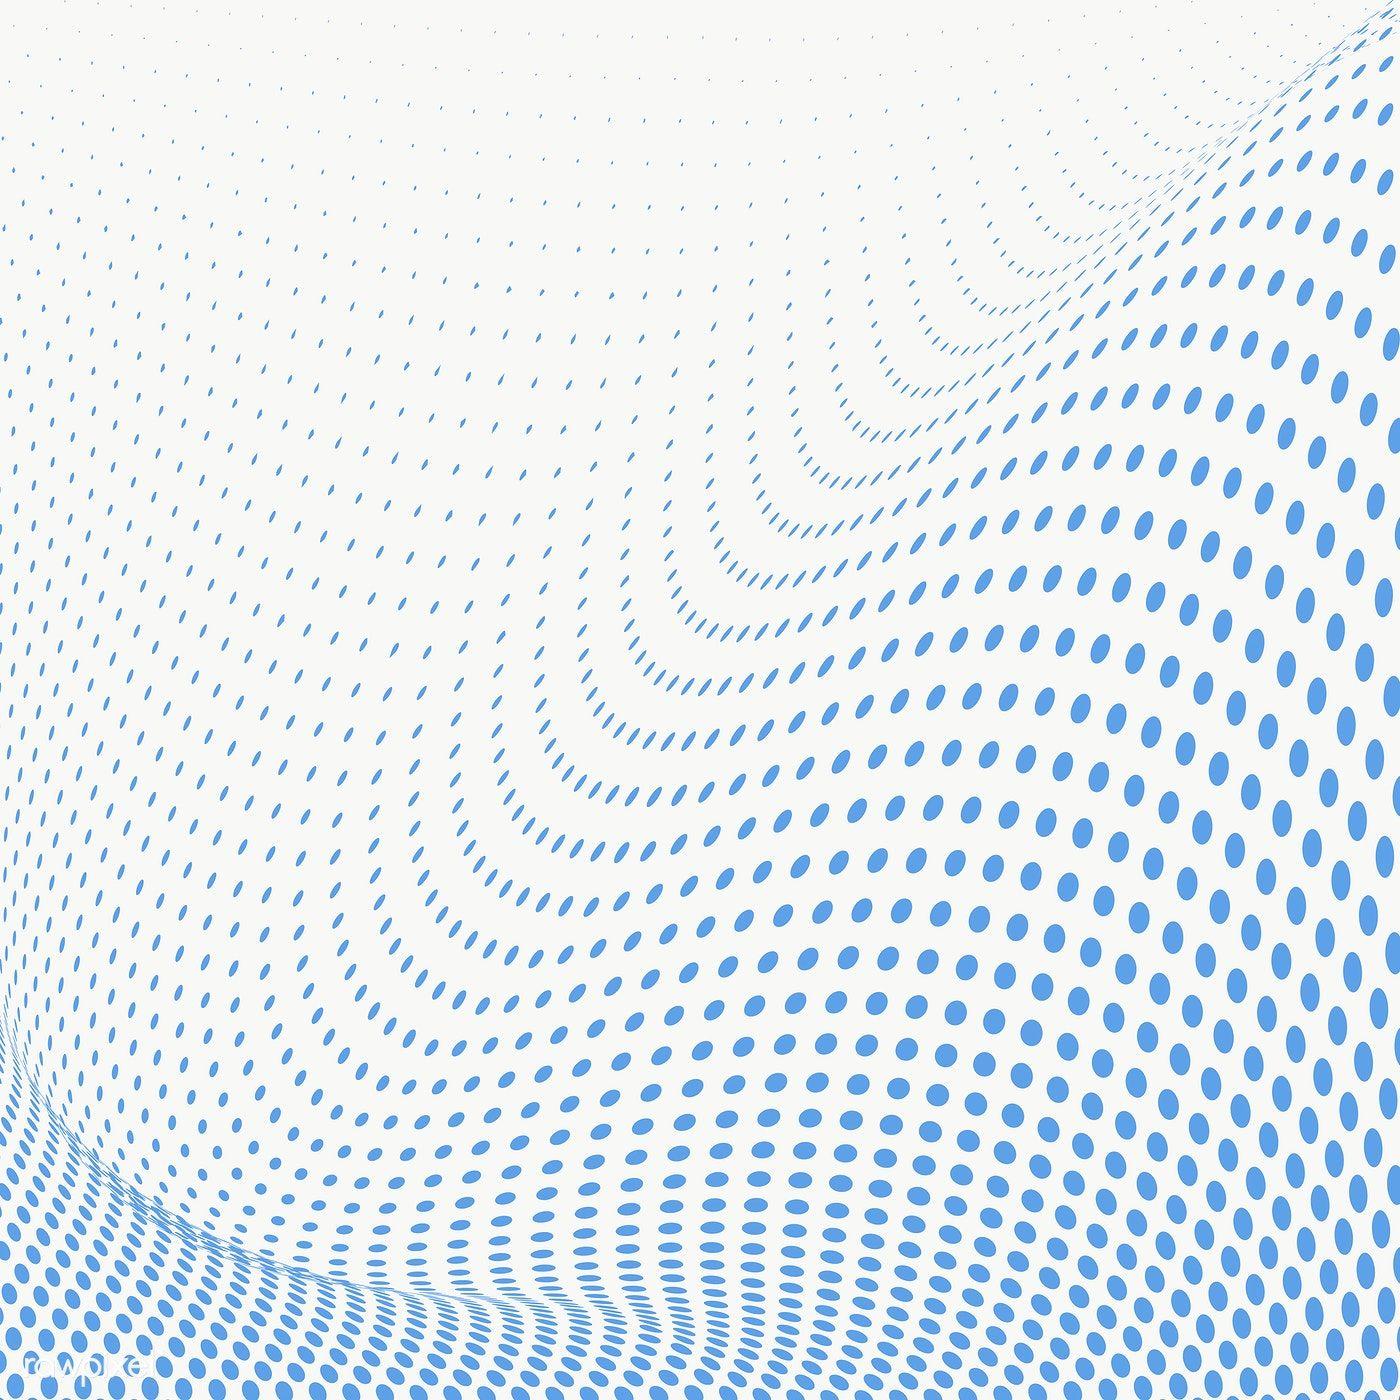 Blue Halftone Dots Design Element Free Image By Rawpixel Com Nunny Halftone Dots Dots Design Design Element